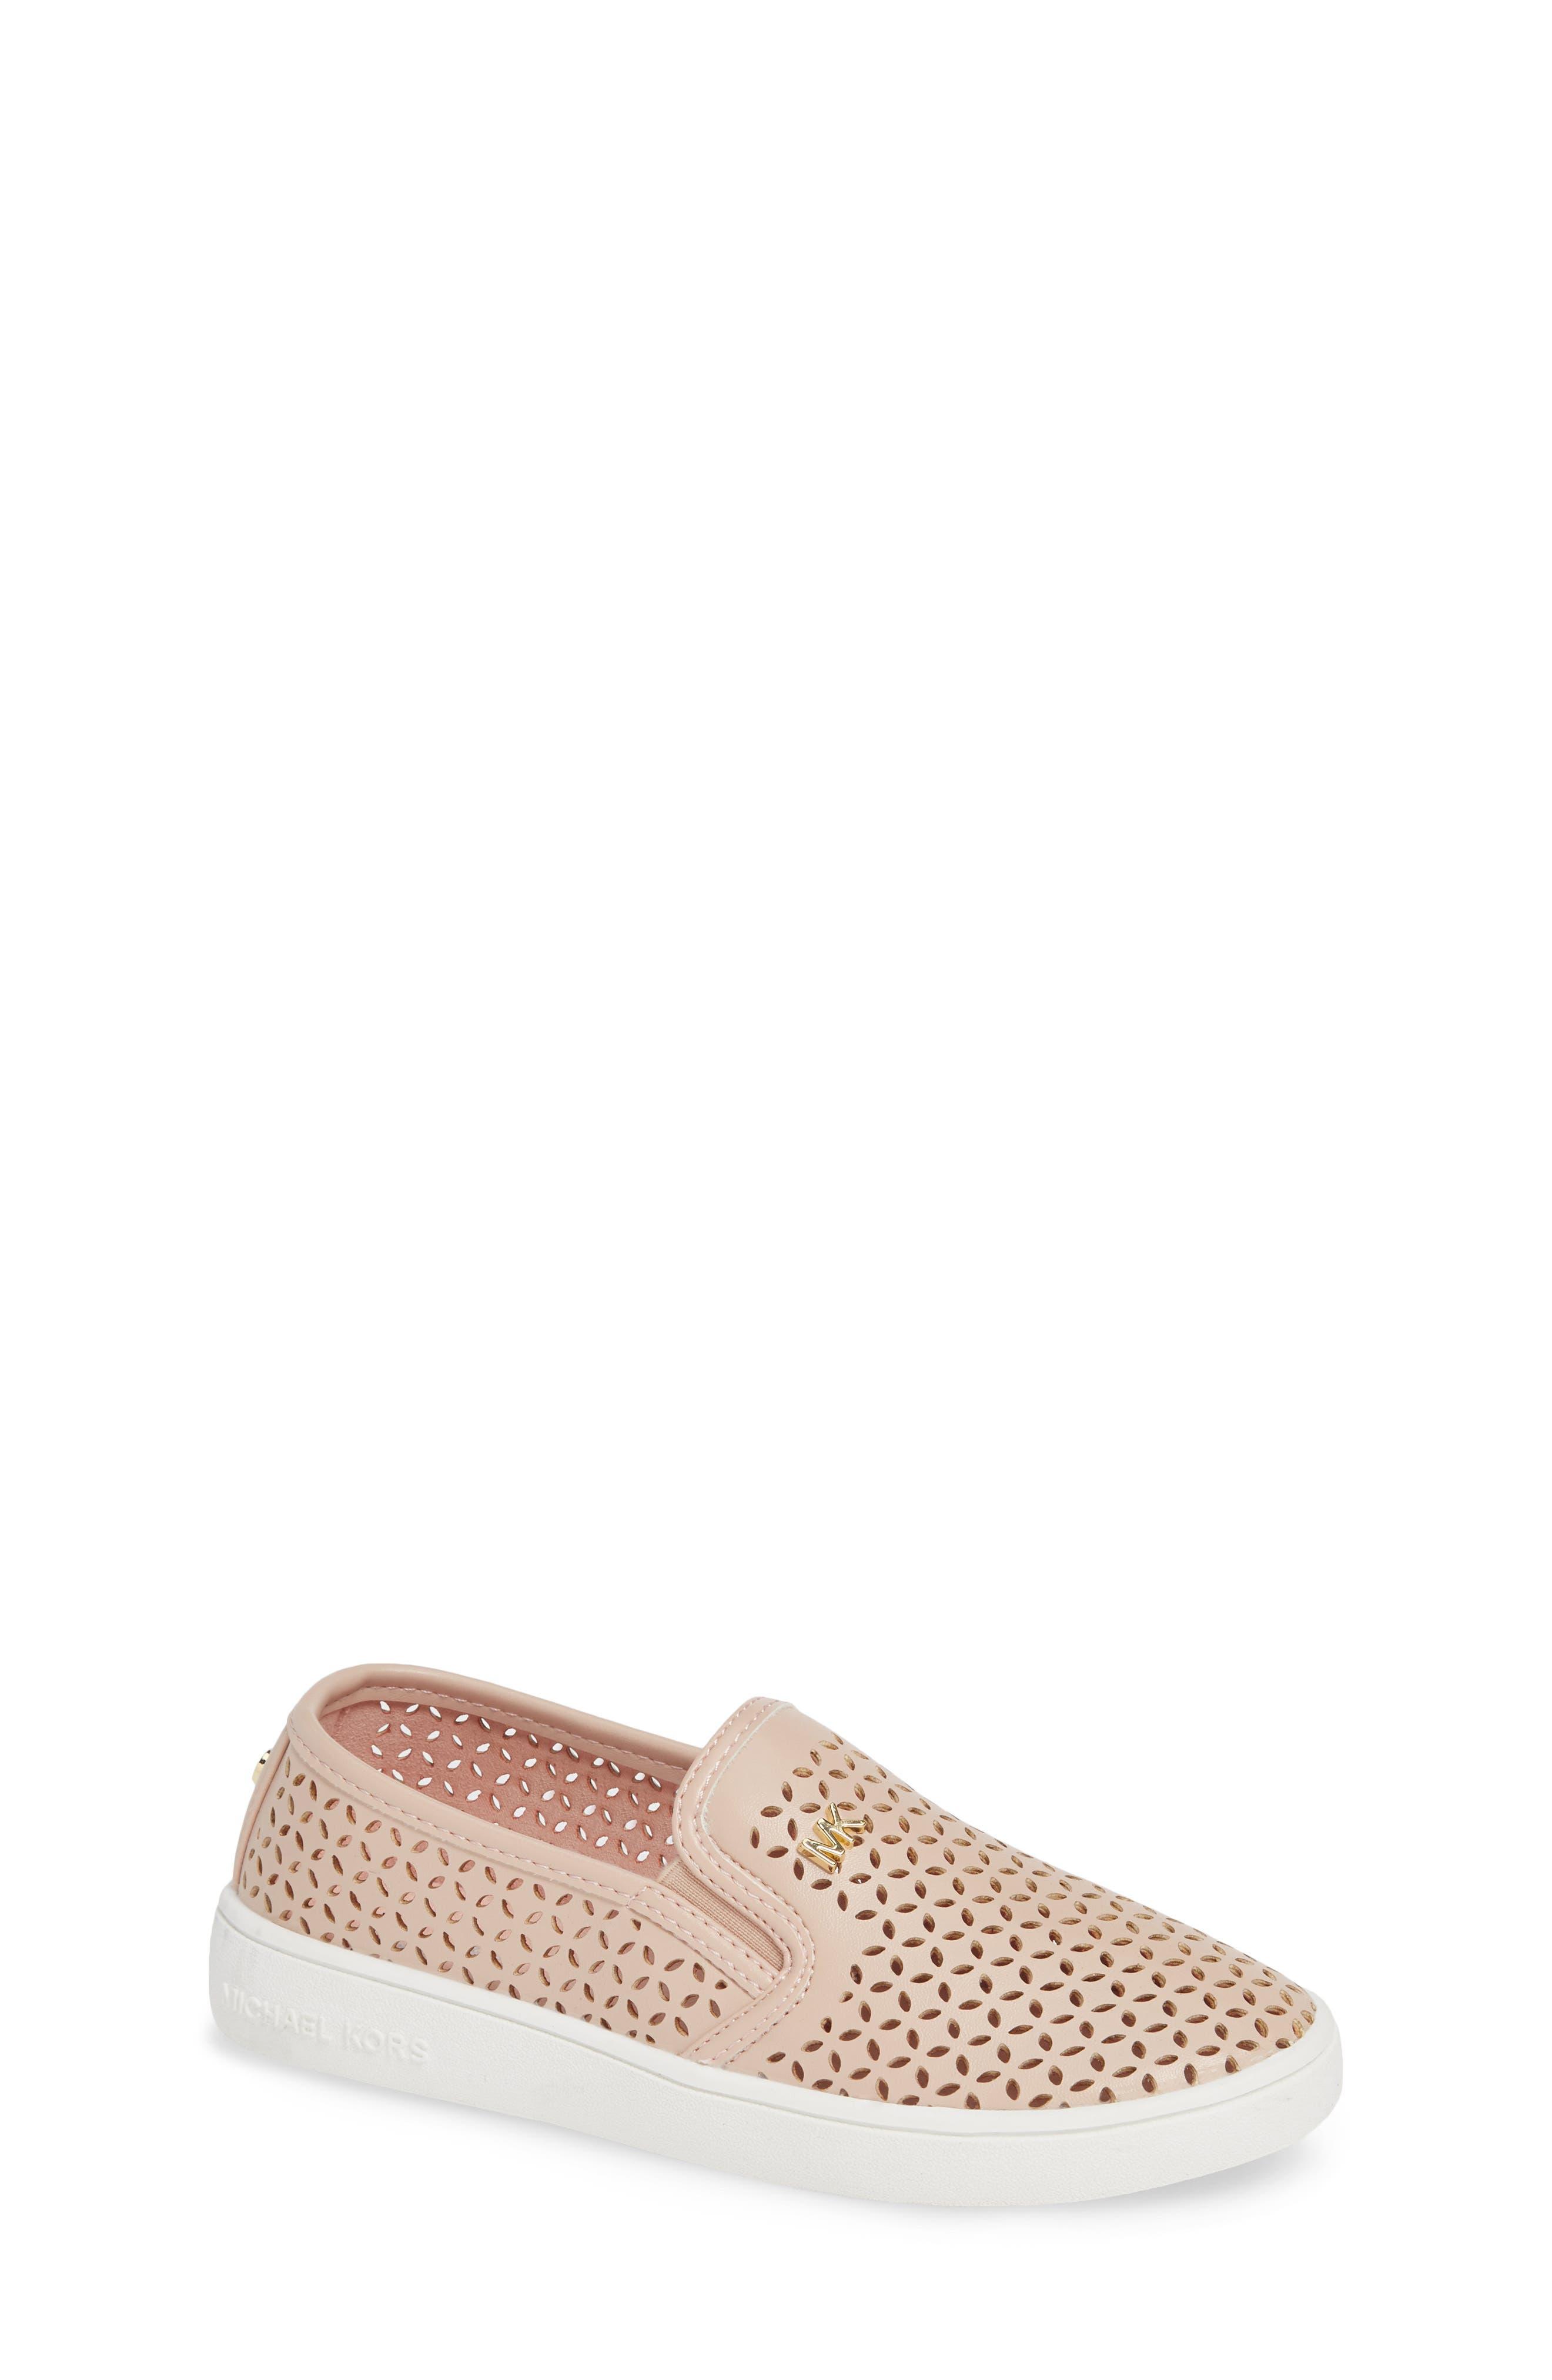 Toddler Girls Michael Michael Kors Jem Olivia Perforated SlipOn Sneaker Size 8 M  Pink